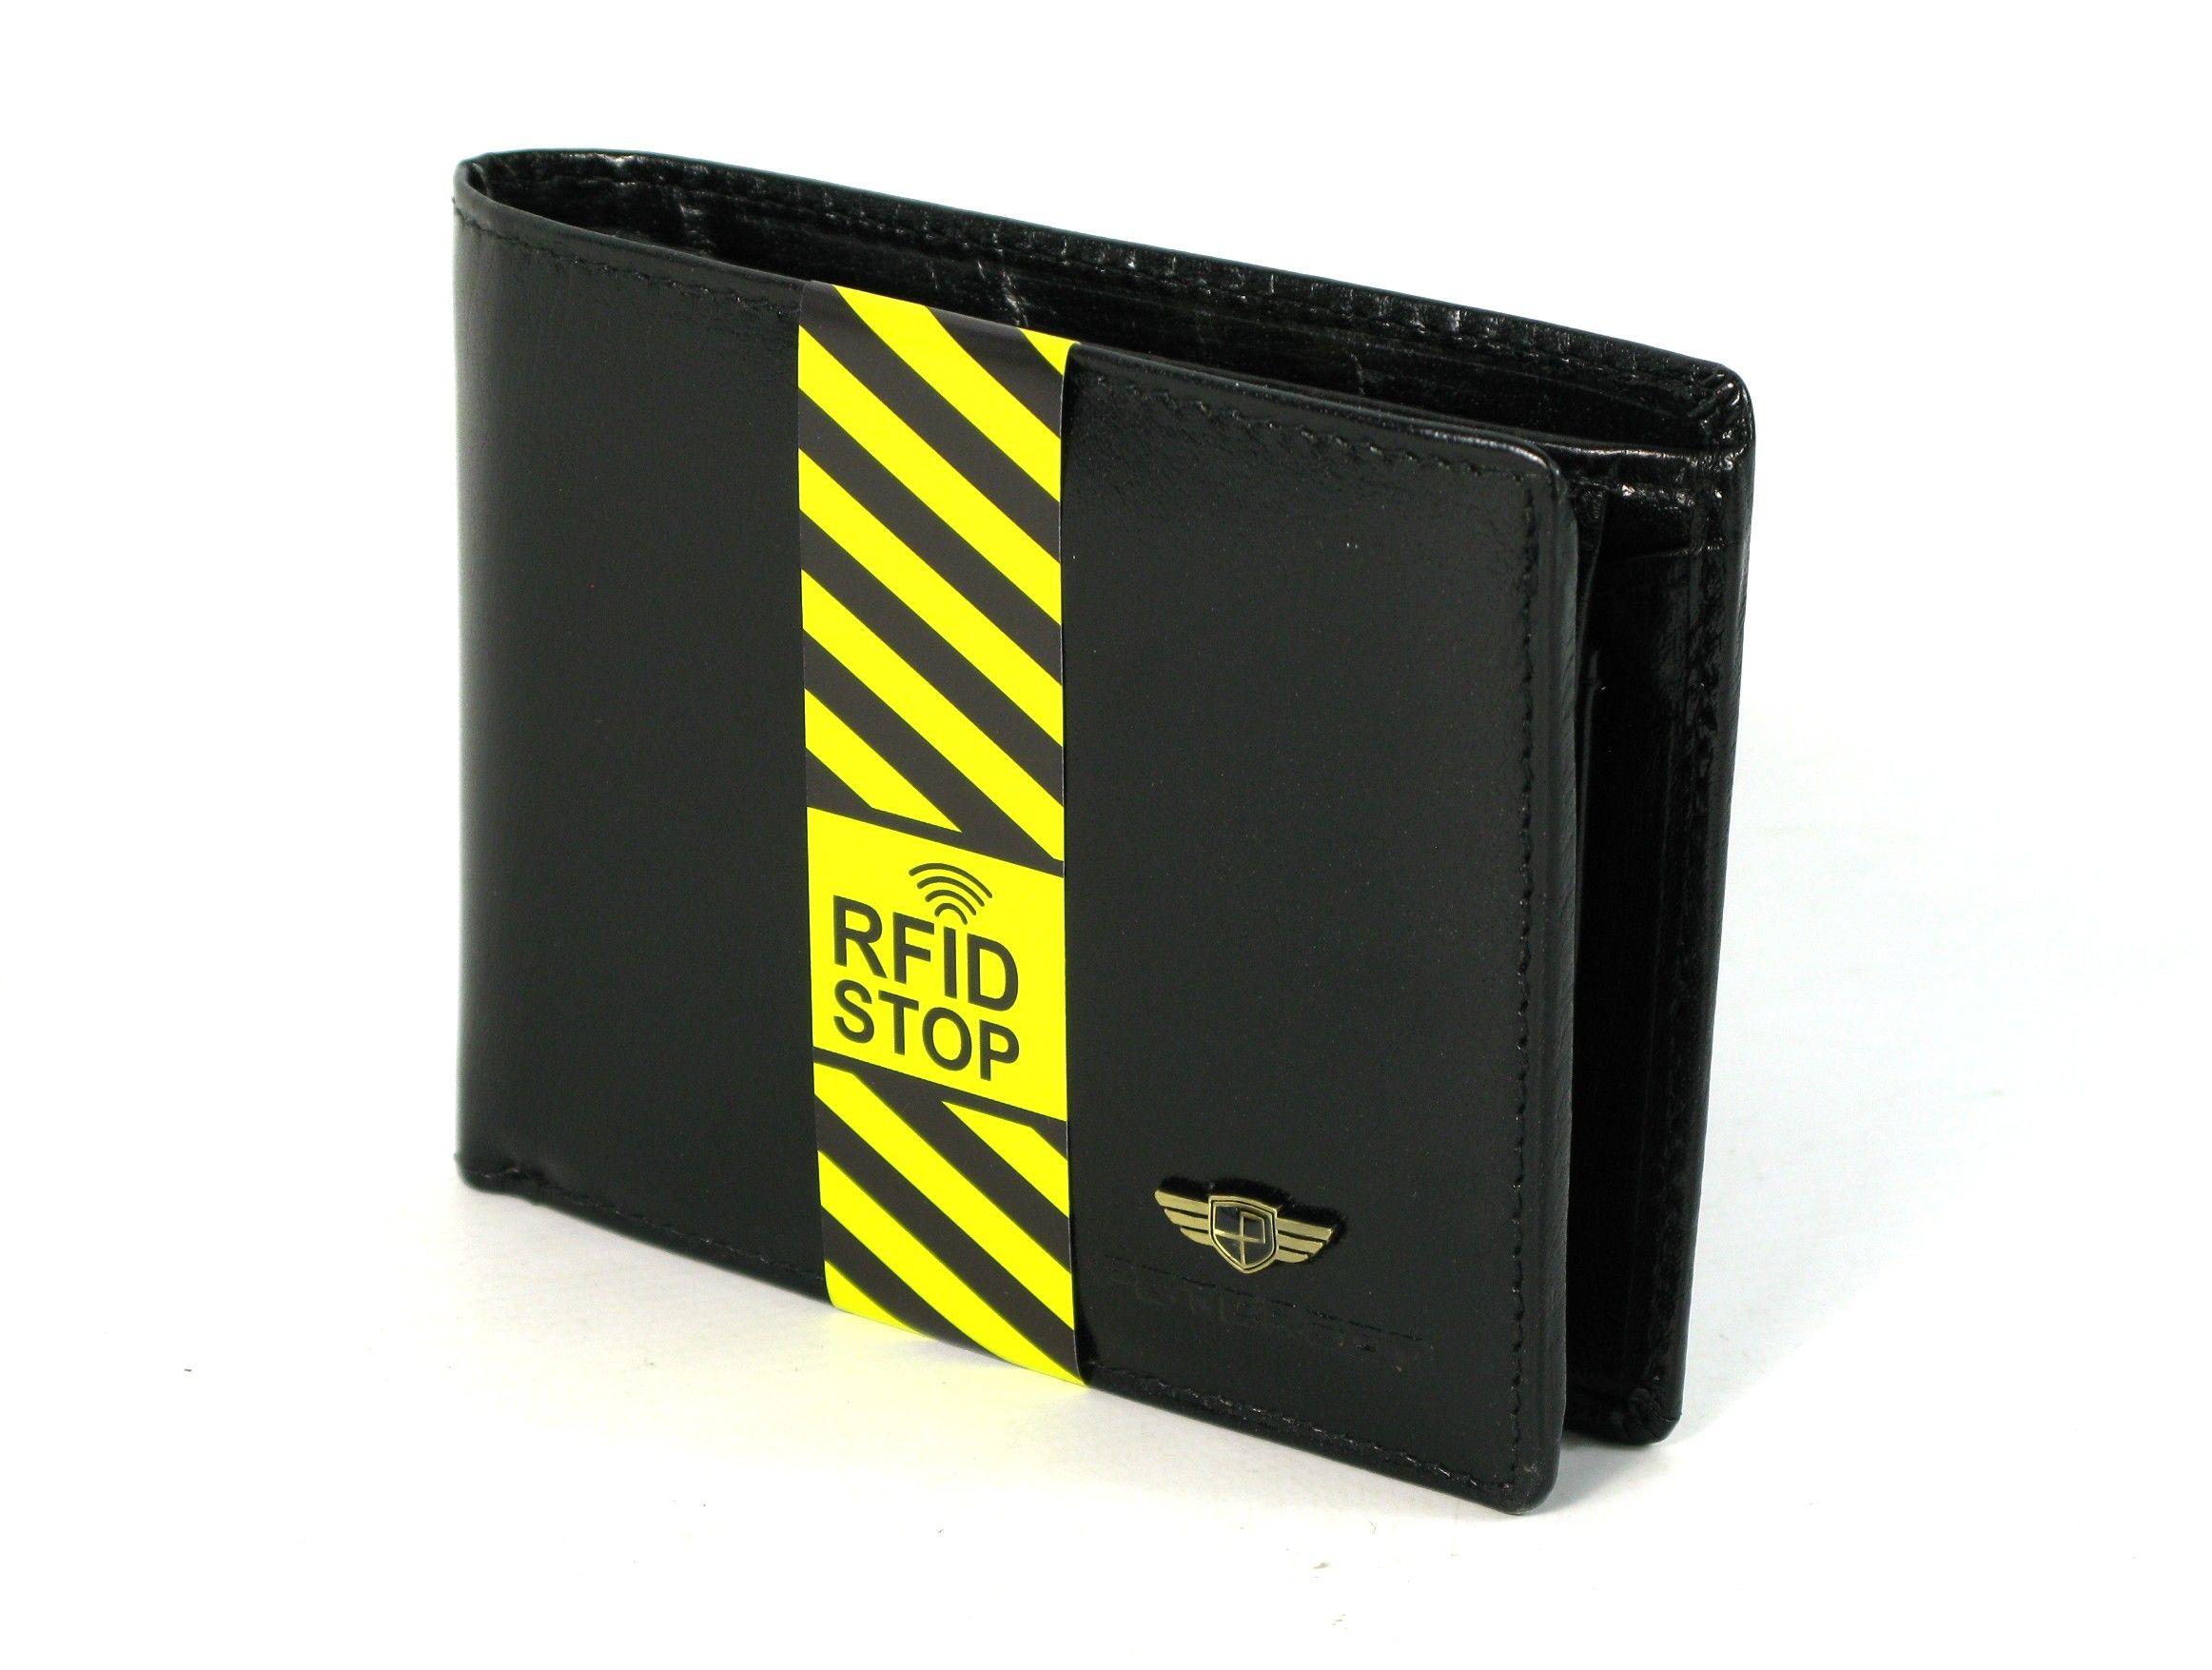 c58cd7b2caf08 Portfel męski PETERSON RW-347-1 RFID SKÓRA czarny | Akcesoria ...